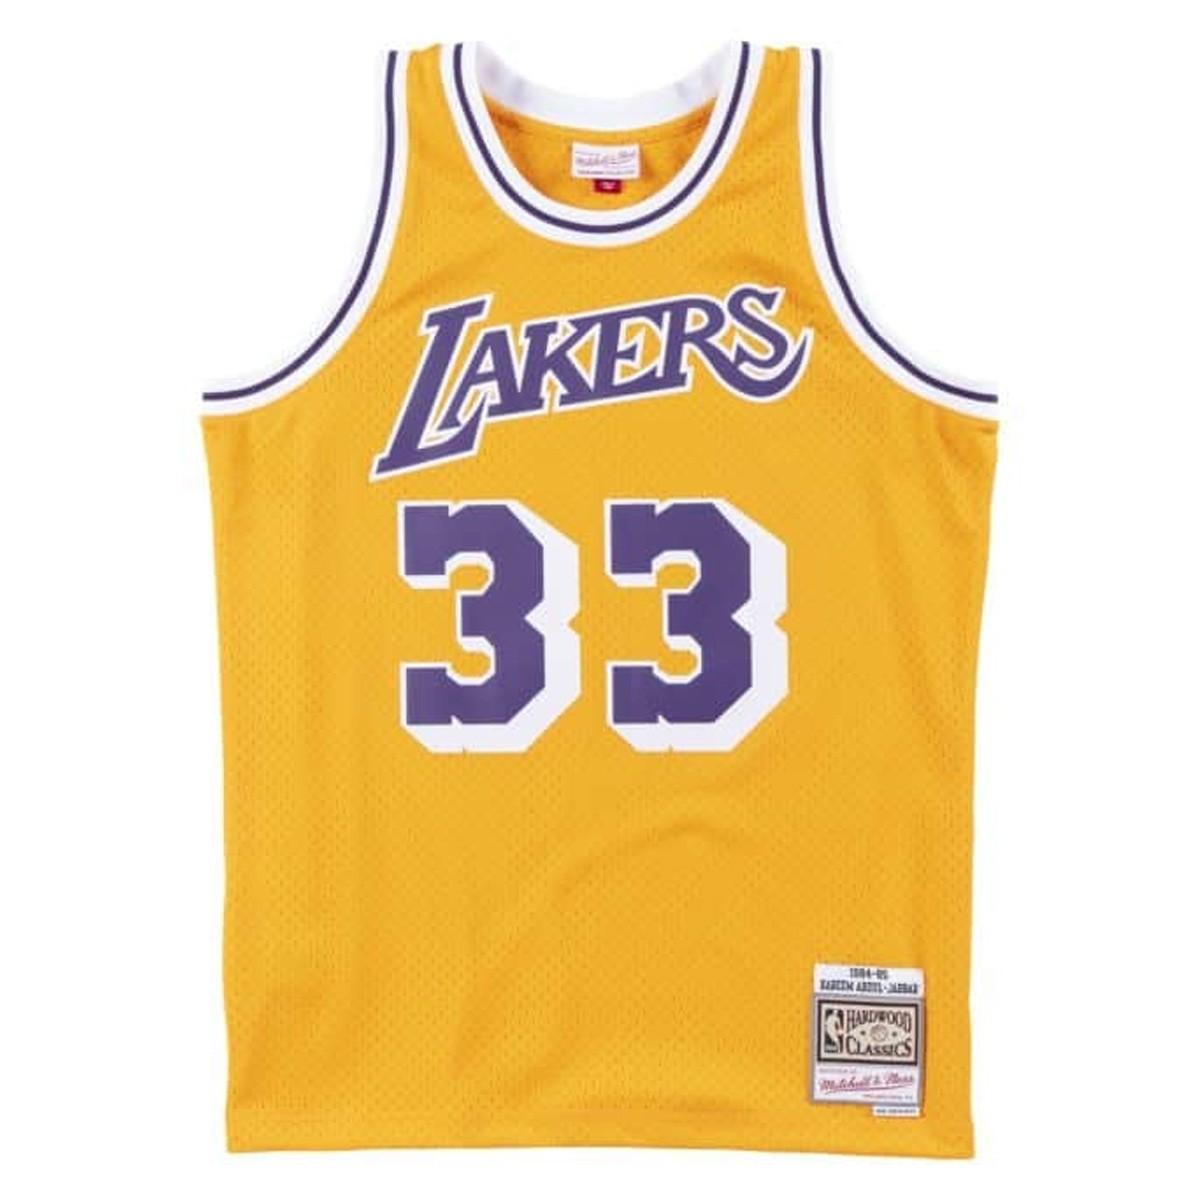 Mitchell & Ness Swingman Jersey Los Angeles Lakers 1984-85 'Kareem Abdul-Jabbar'